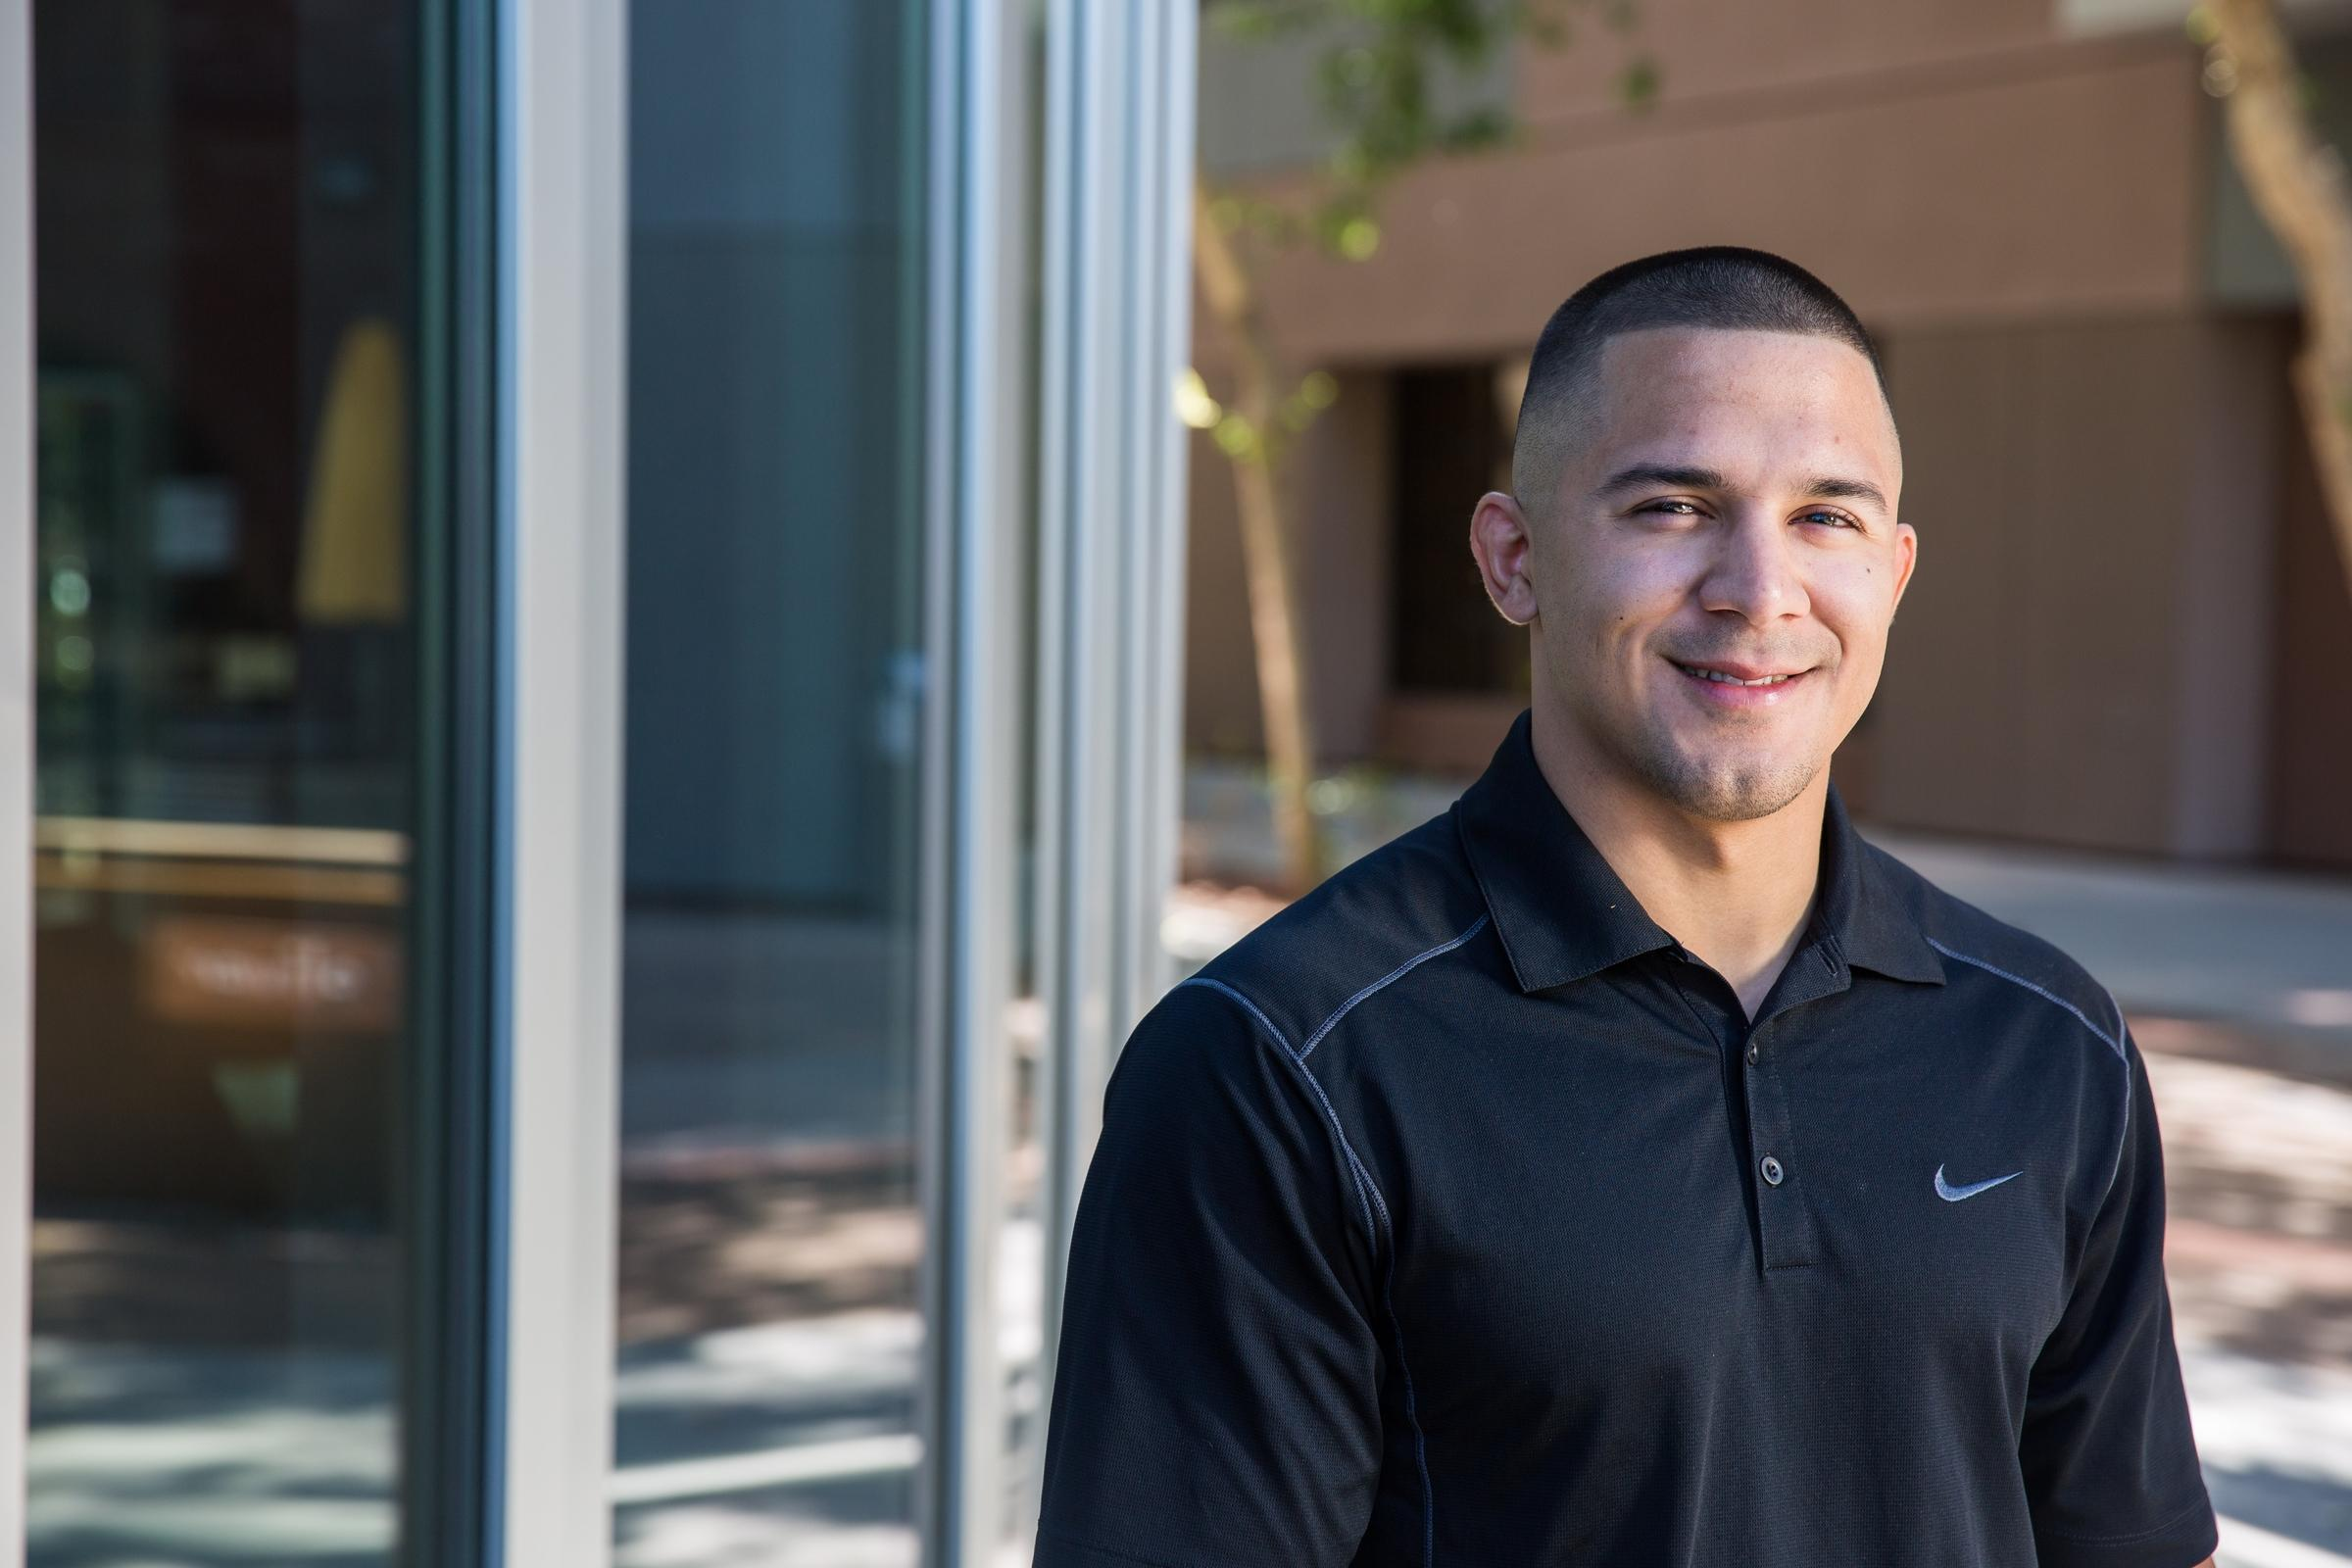 Soon-to-be ASU graduate Andy Meza